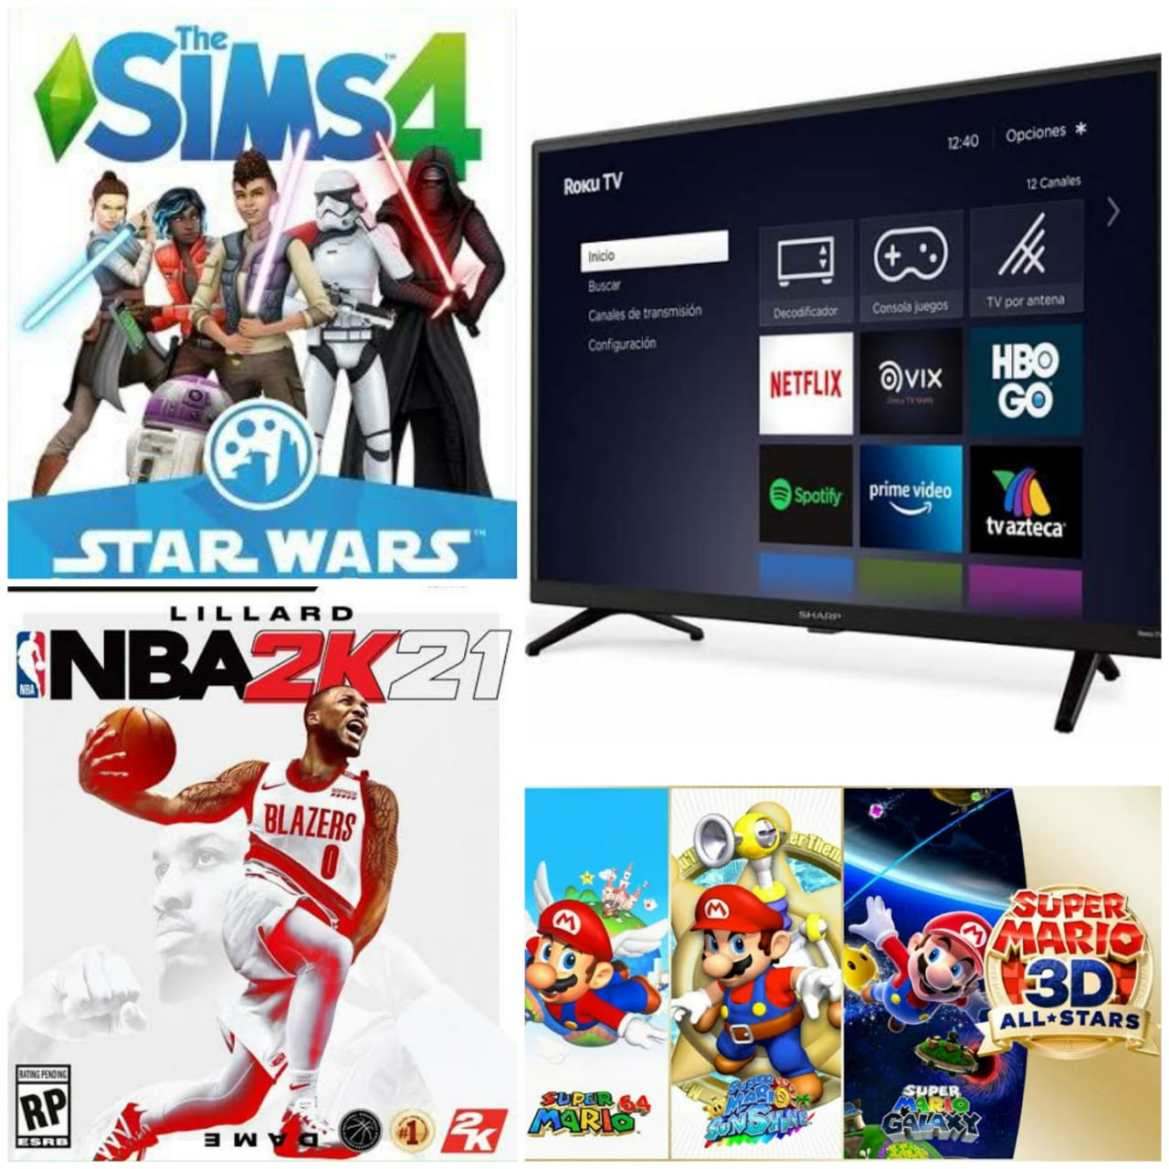 Reseña: Super Mario 3D All-Stars, Sharp Roku TV, NBA 2K21 y The Sims 4, Star Wars: Journey to Batuu